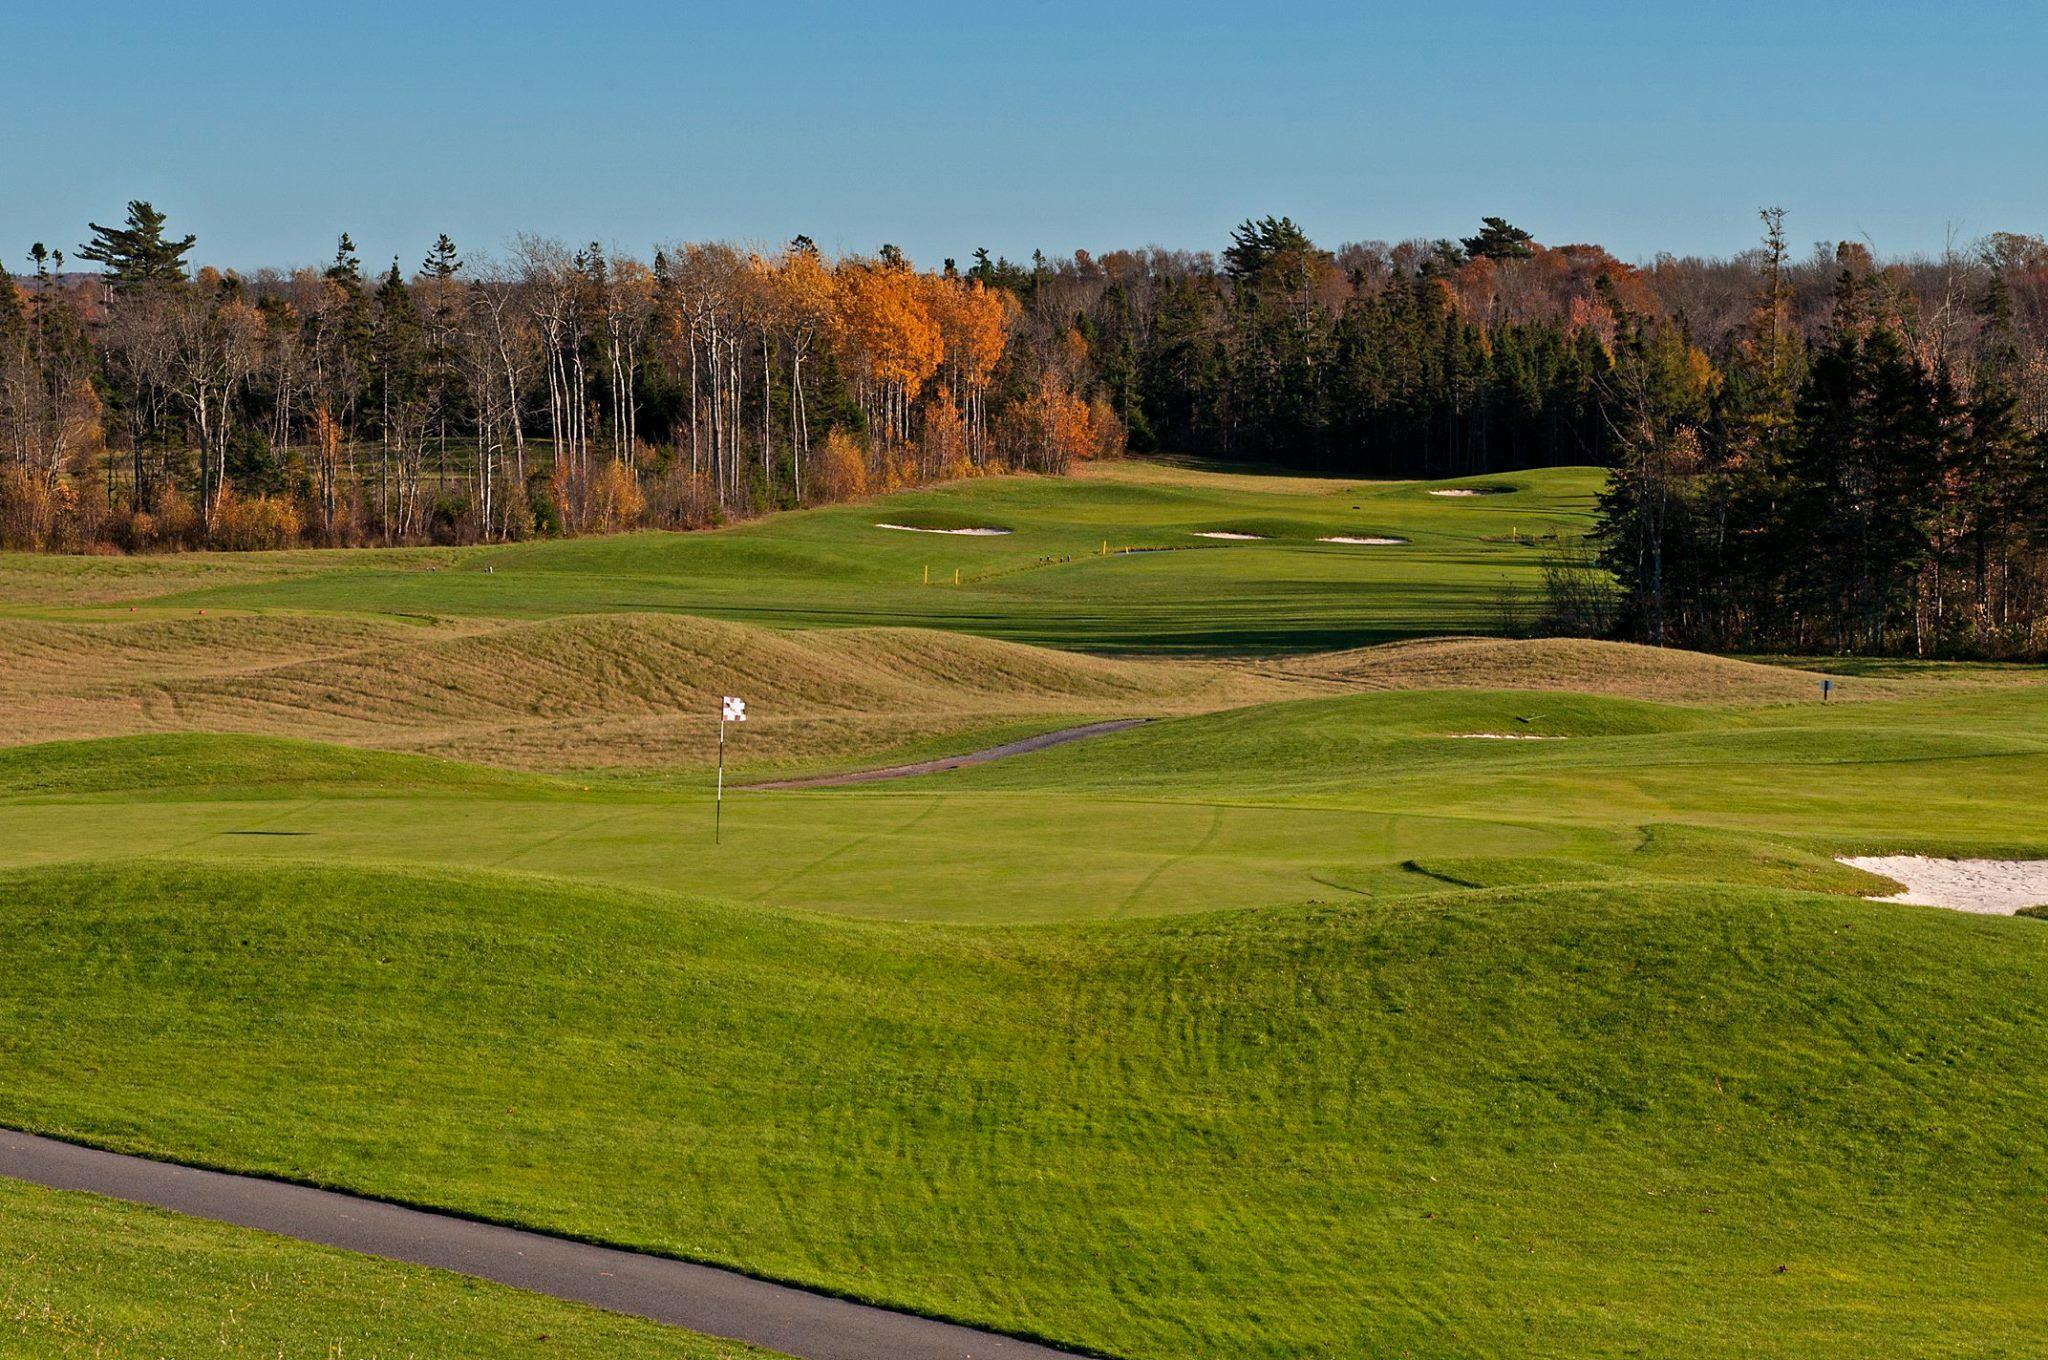 Avondale golf course cover picture